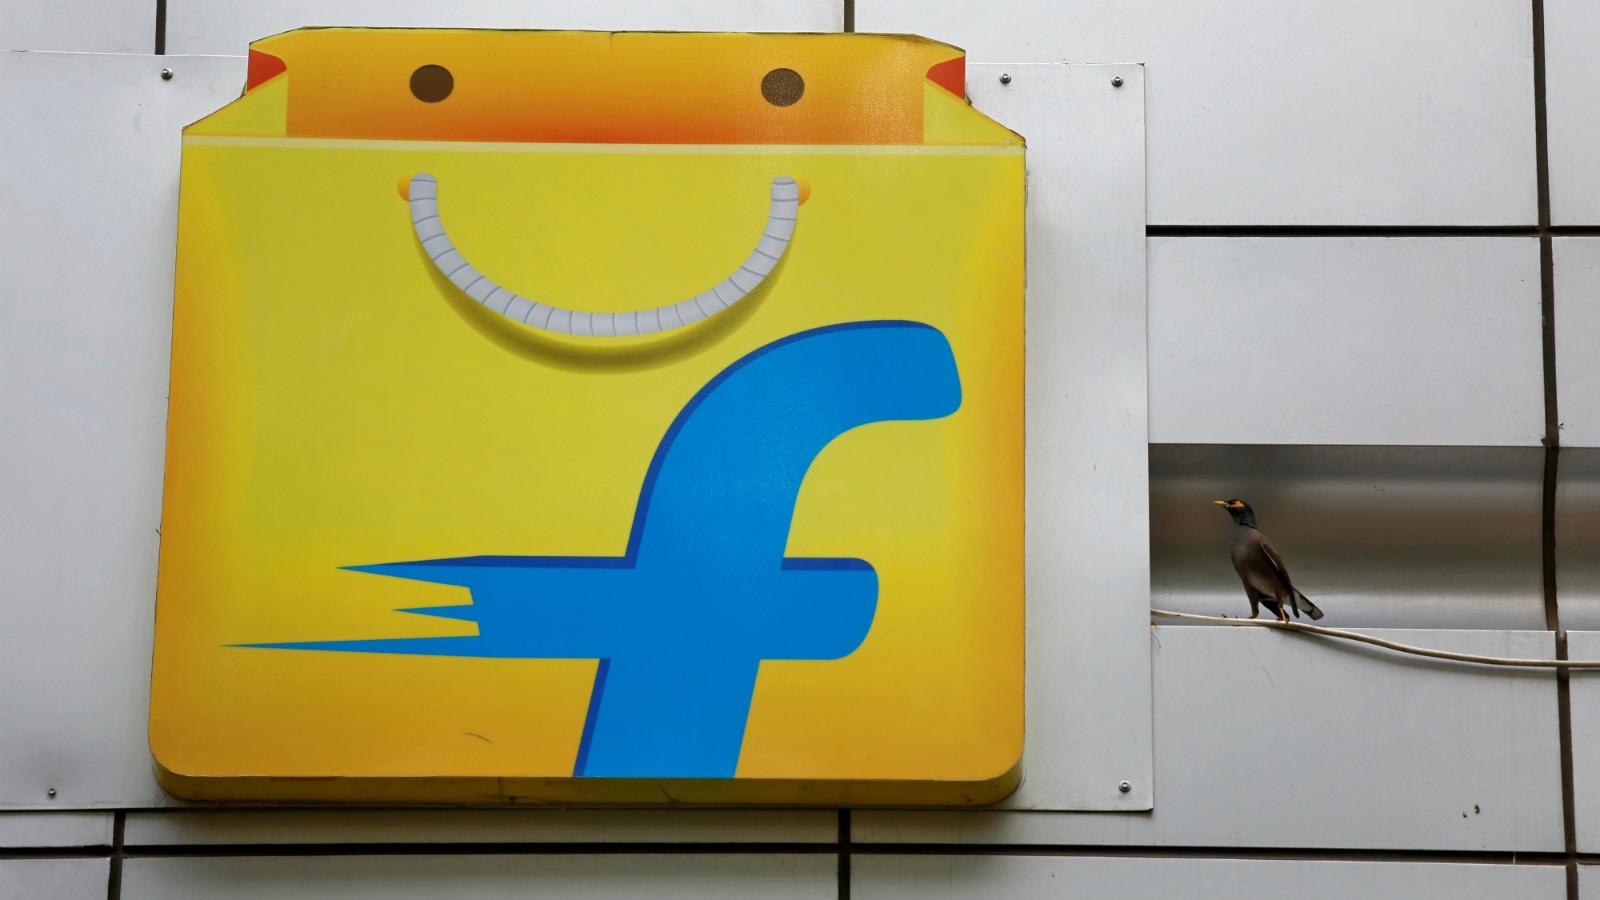 828b949ae51 Walmart seals Flipkart deal, set for round two in India — Quartz India